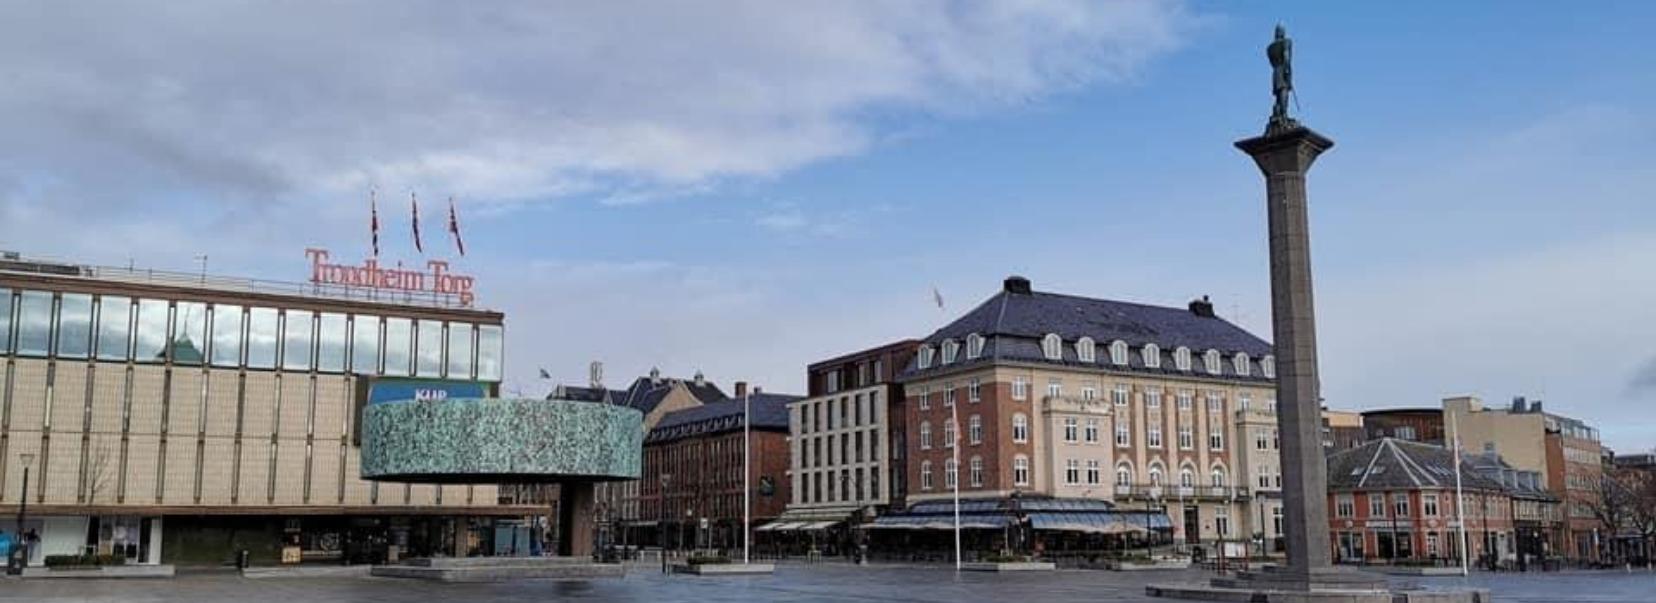 Trondheim Døveforening